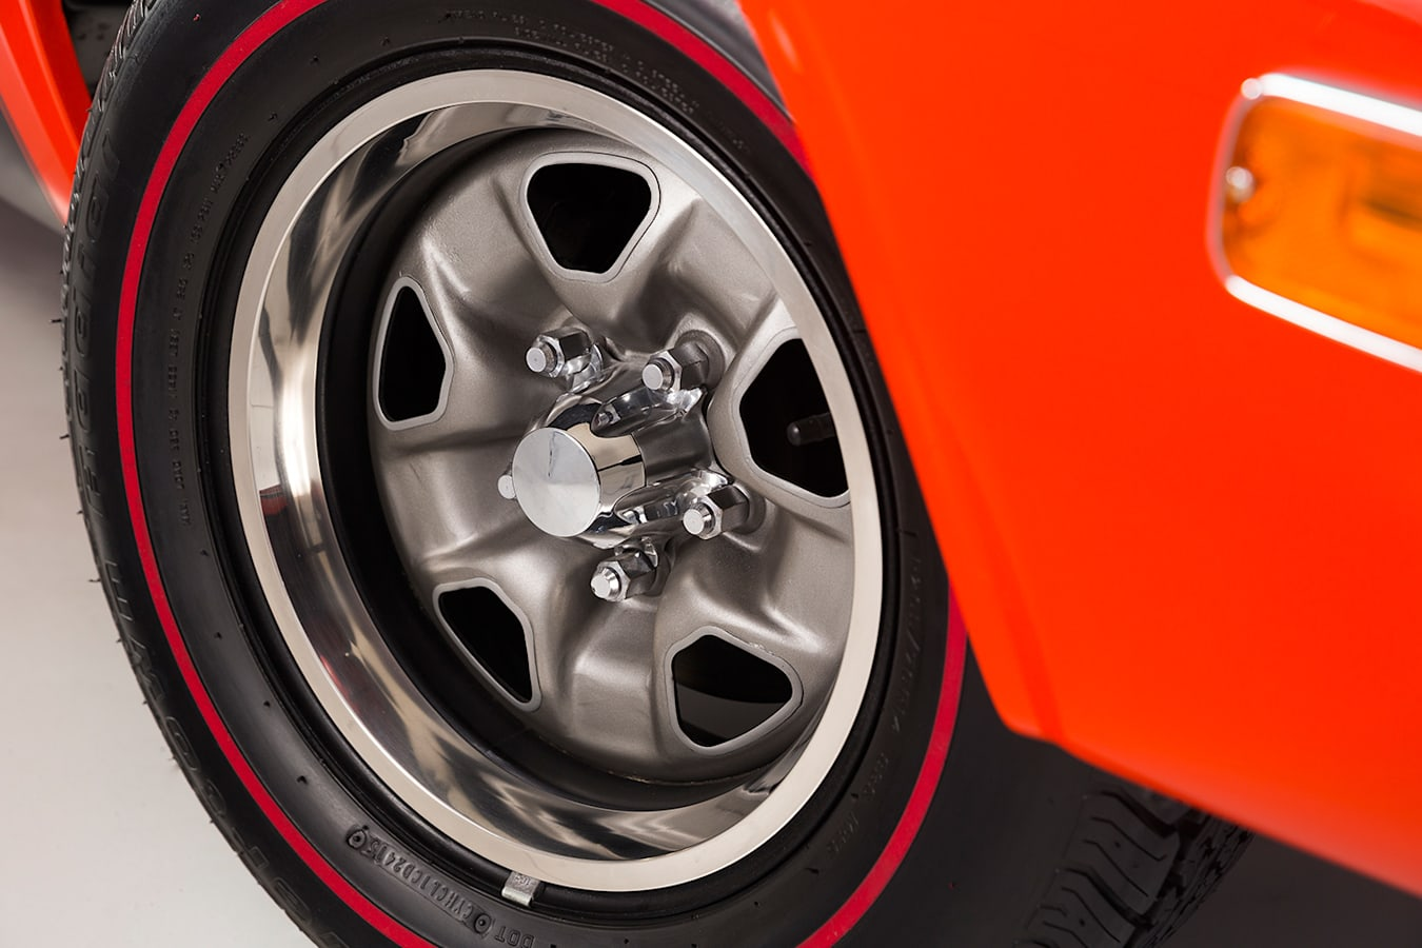 Chrysler Charger wheel